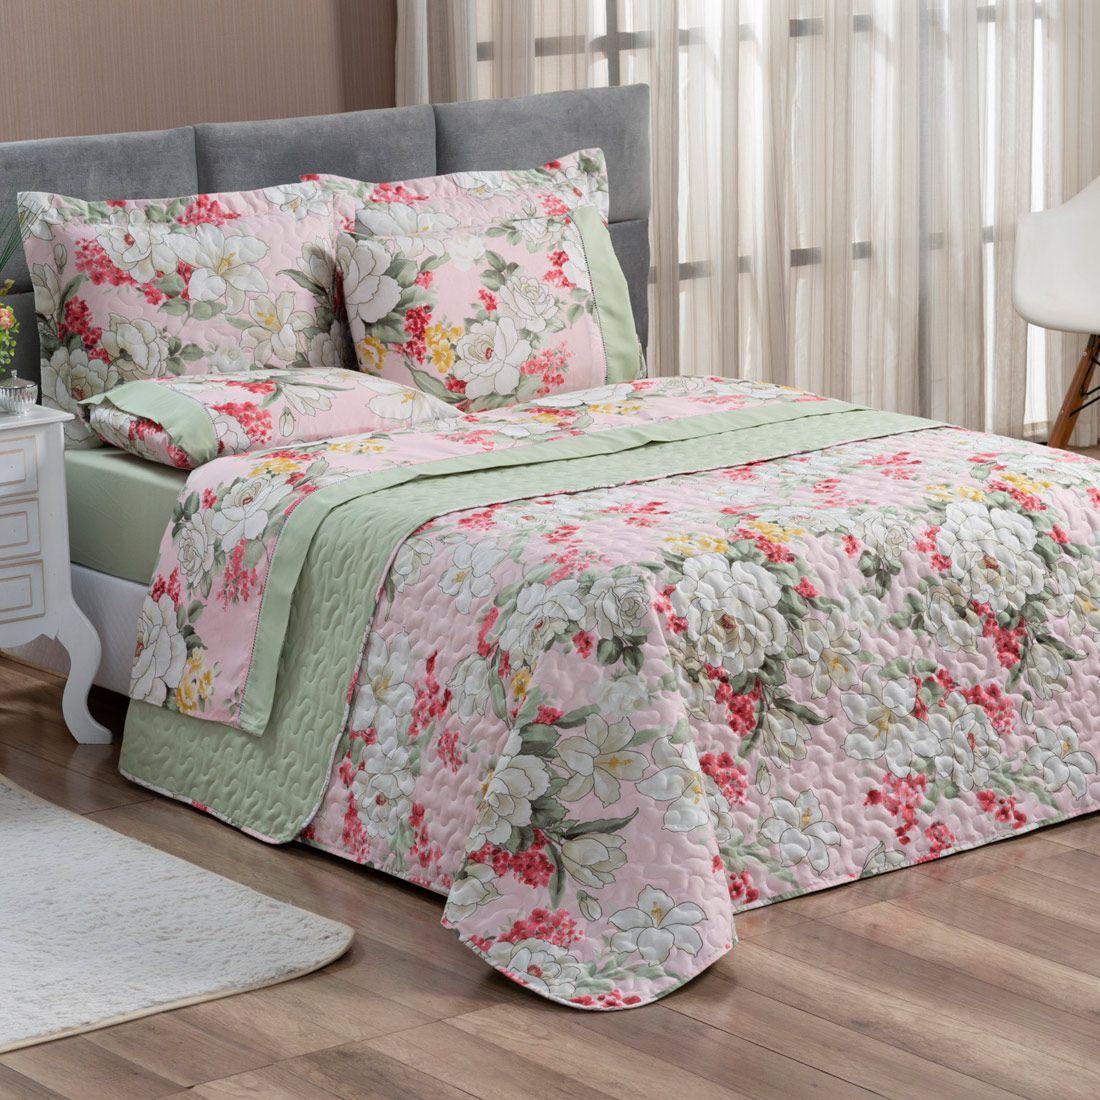 Cobre Leito Forest Floral Verde/Rosê Casal Dupla Face Micropercal 200 fios 03 peças